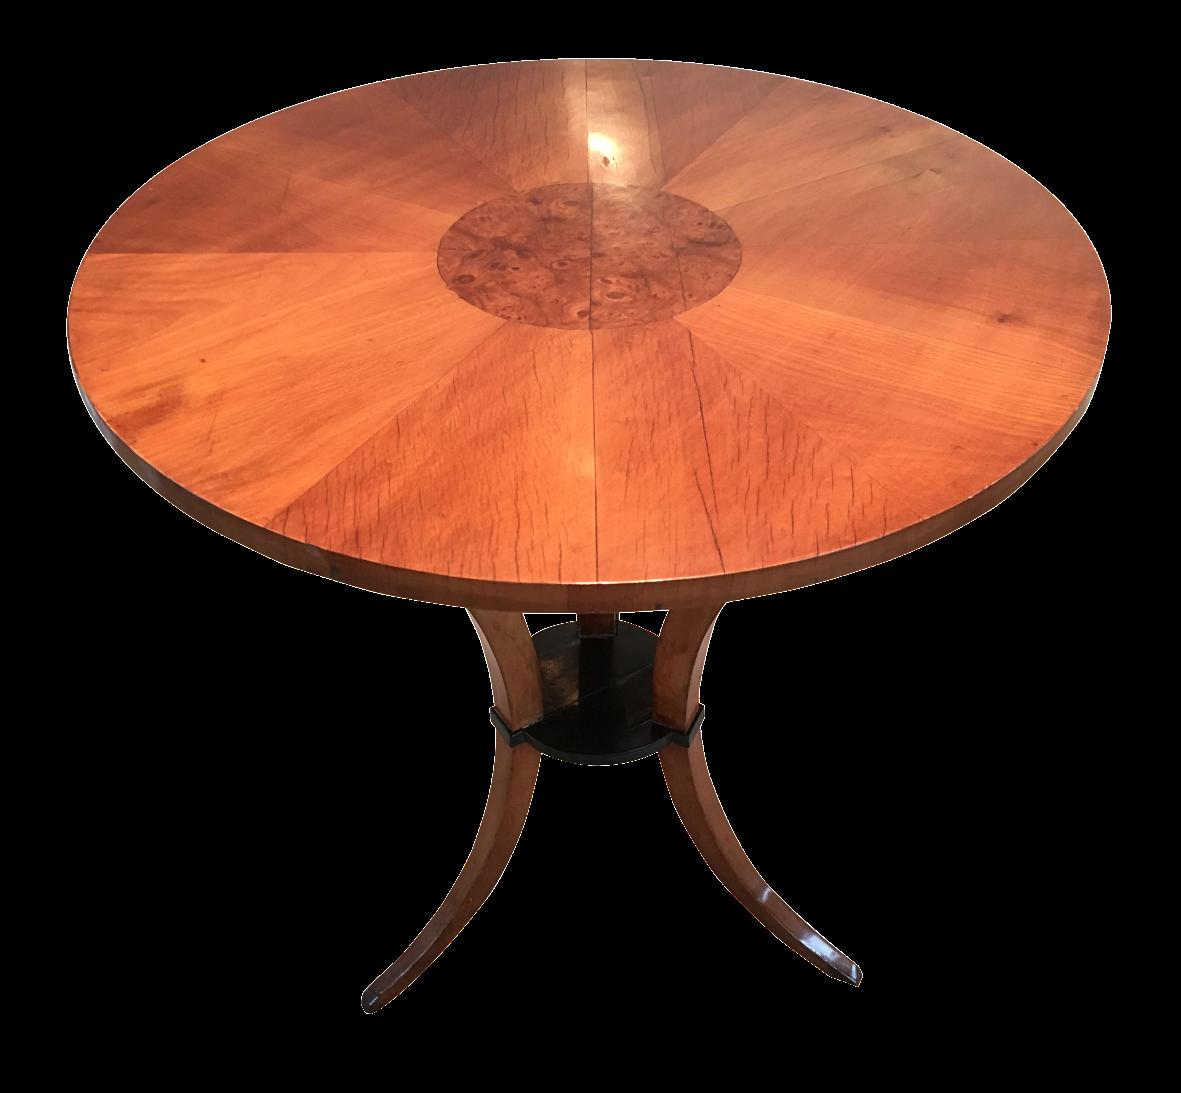 19th c austrian biedermeier center table chairish for Table th center